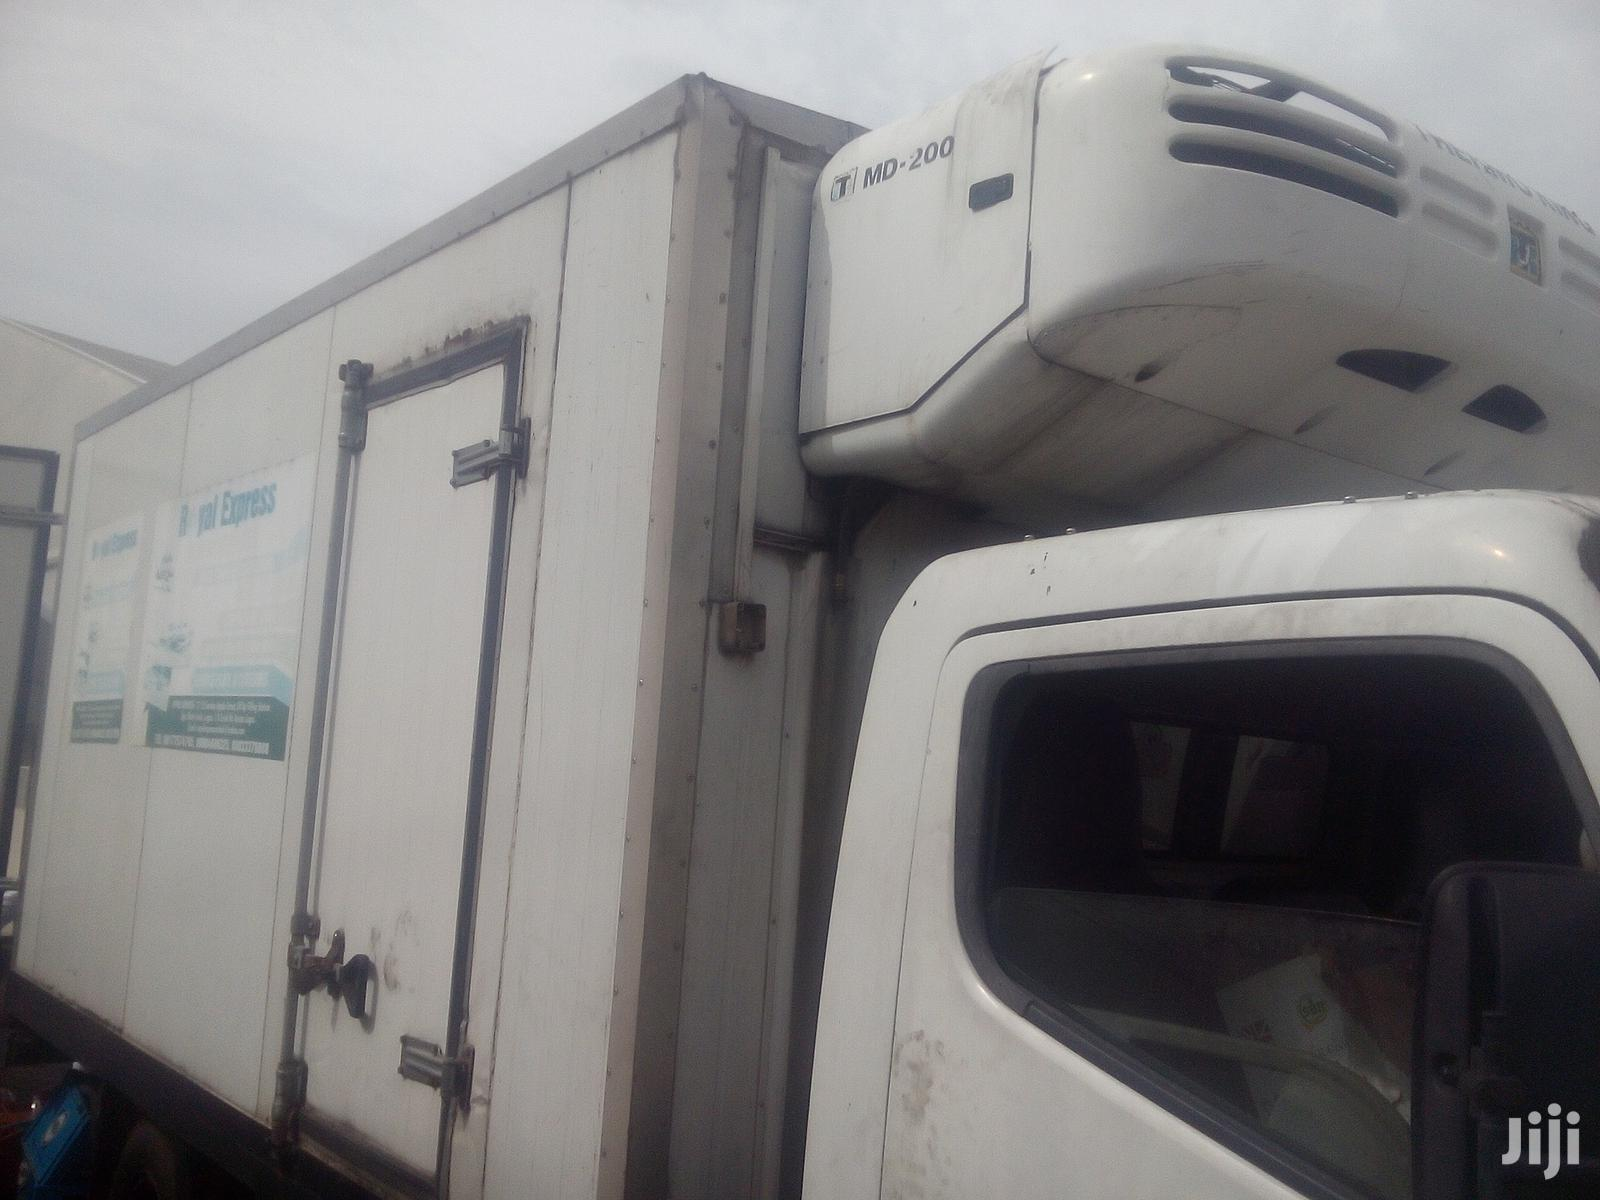 Tokunbo Japanese Mitsubishi Fuso Canter Freezer Truck 2006 White | Trucks & Trailers for sale in Ikotun/Igando, Lagos State, Nigeria